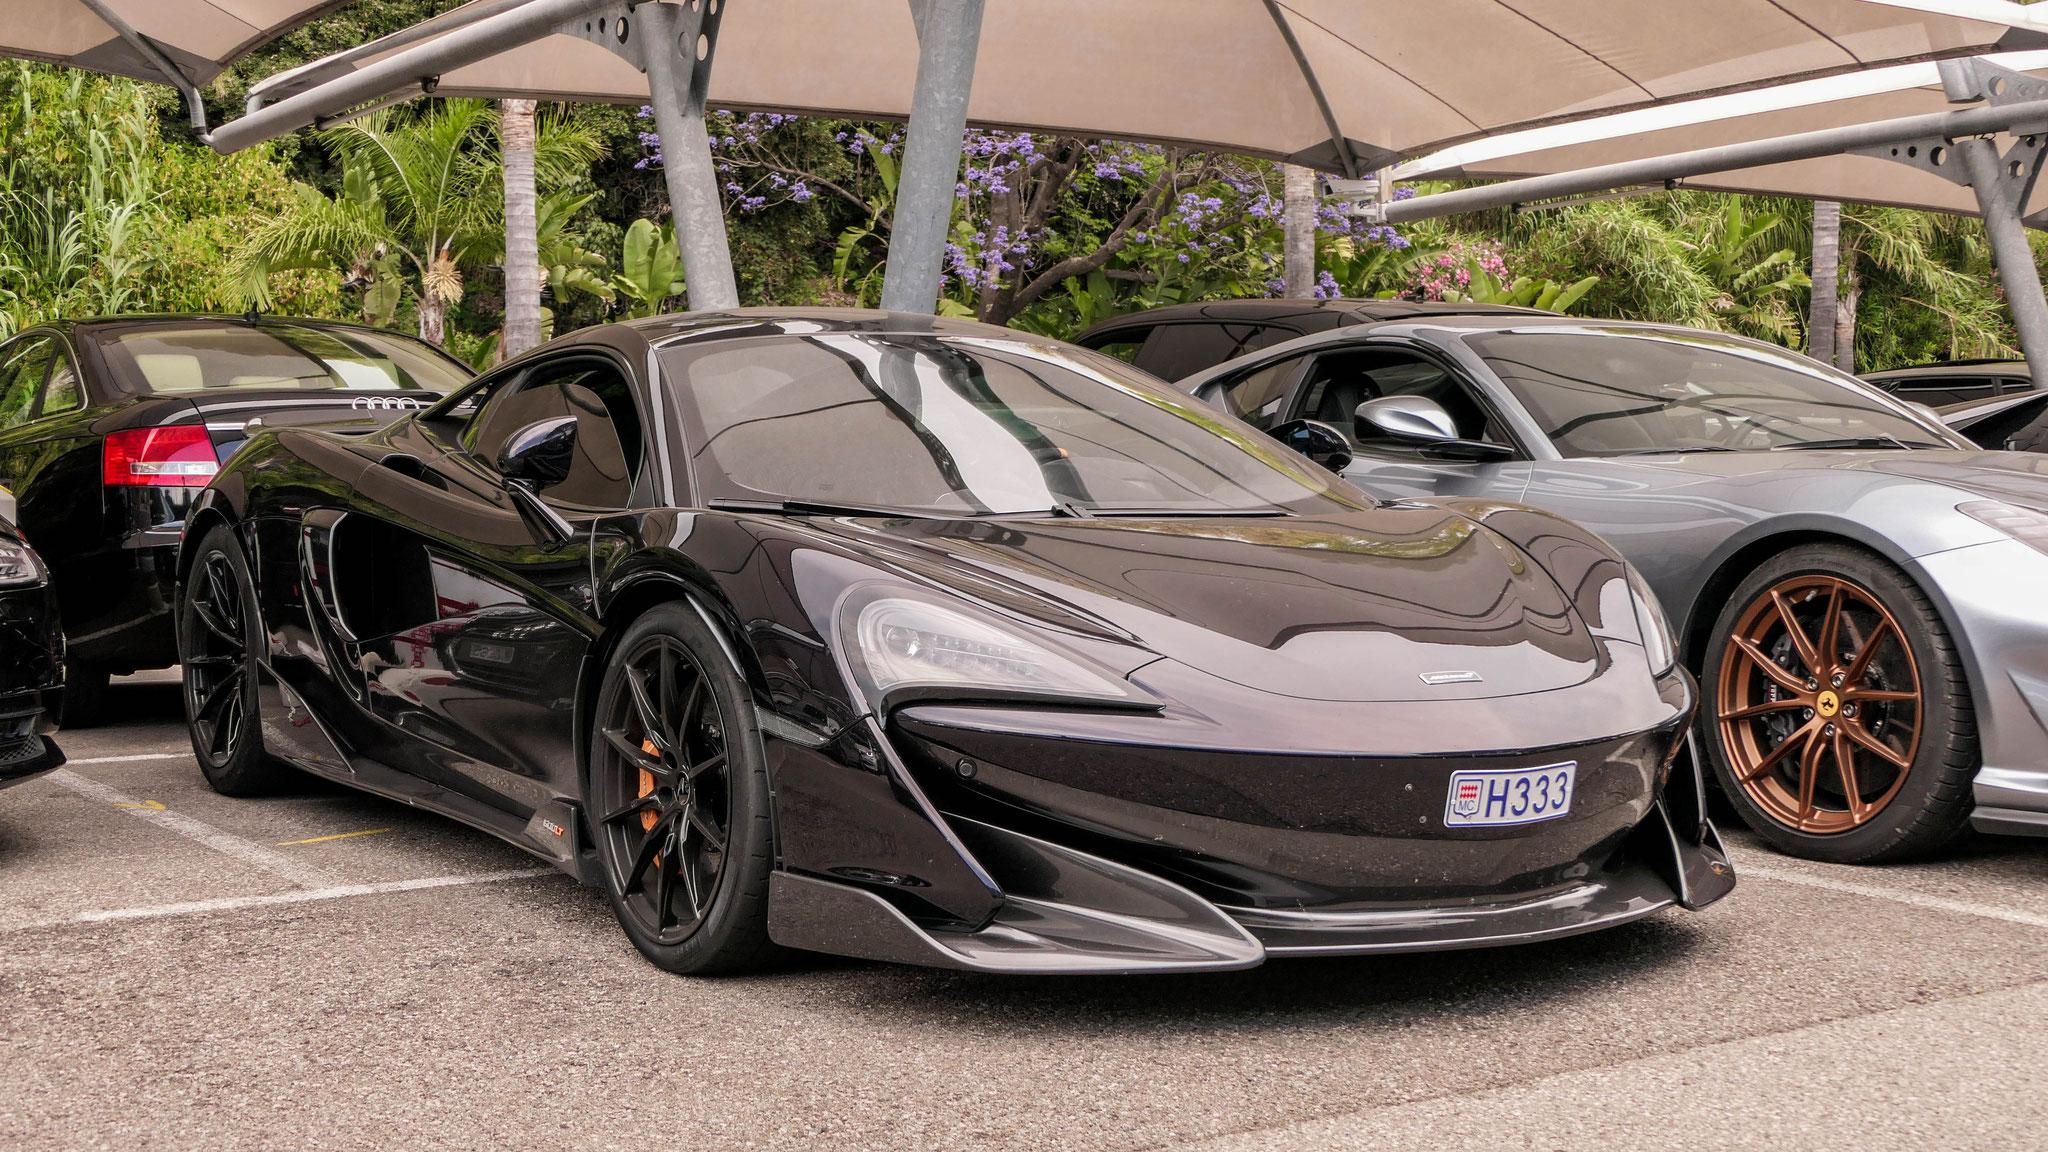 McLaren 600LT - H333 (MC)